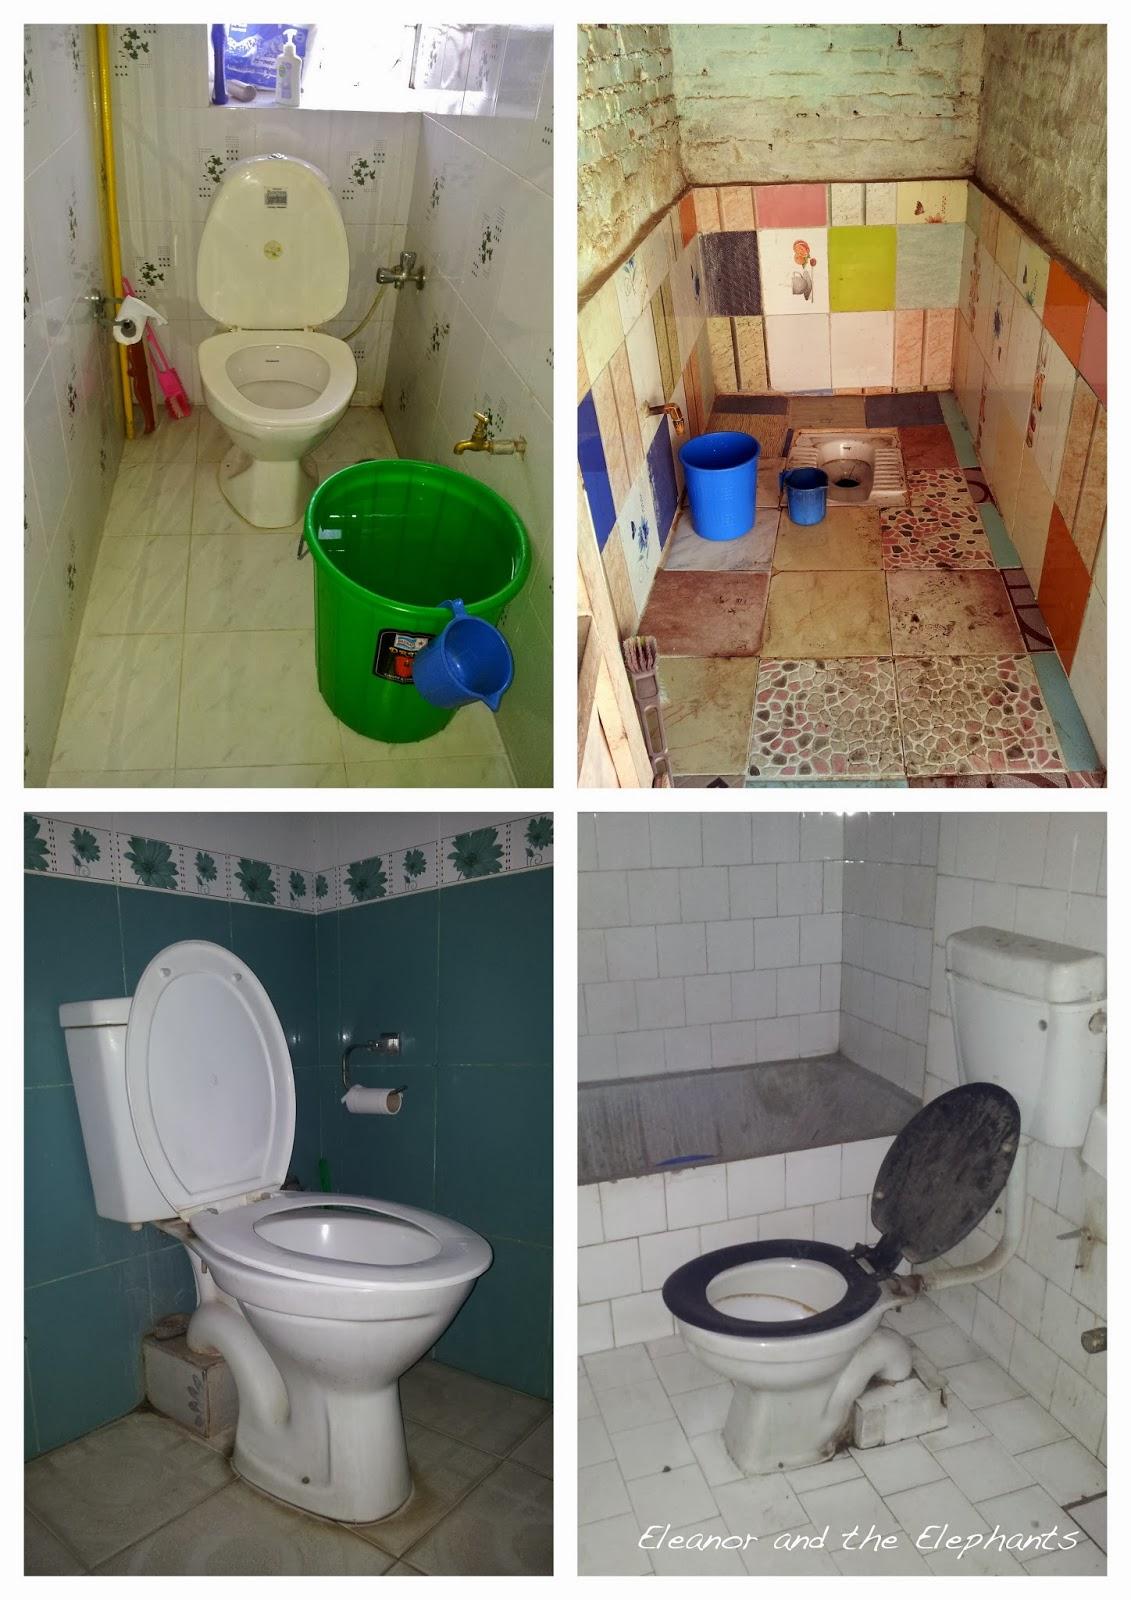 Toilets in Nepal - Keeping Things Clean Pt 2   Eleanor & the Elephants